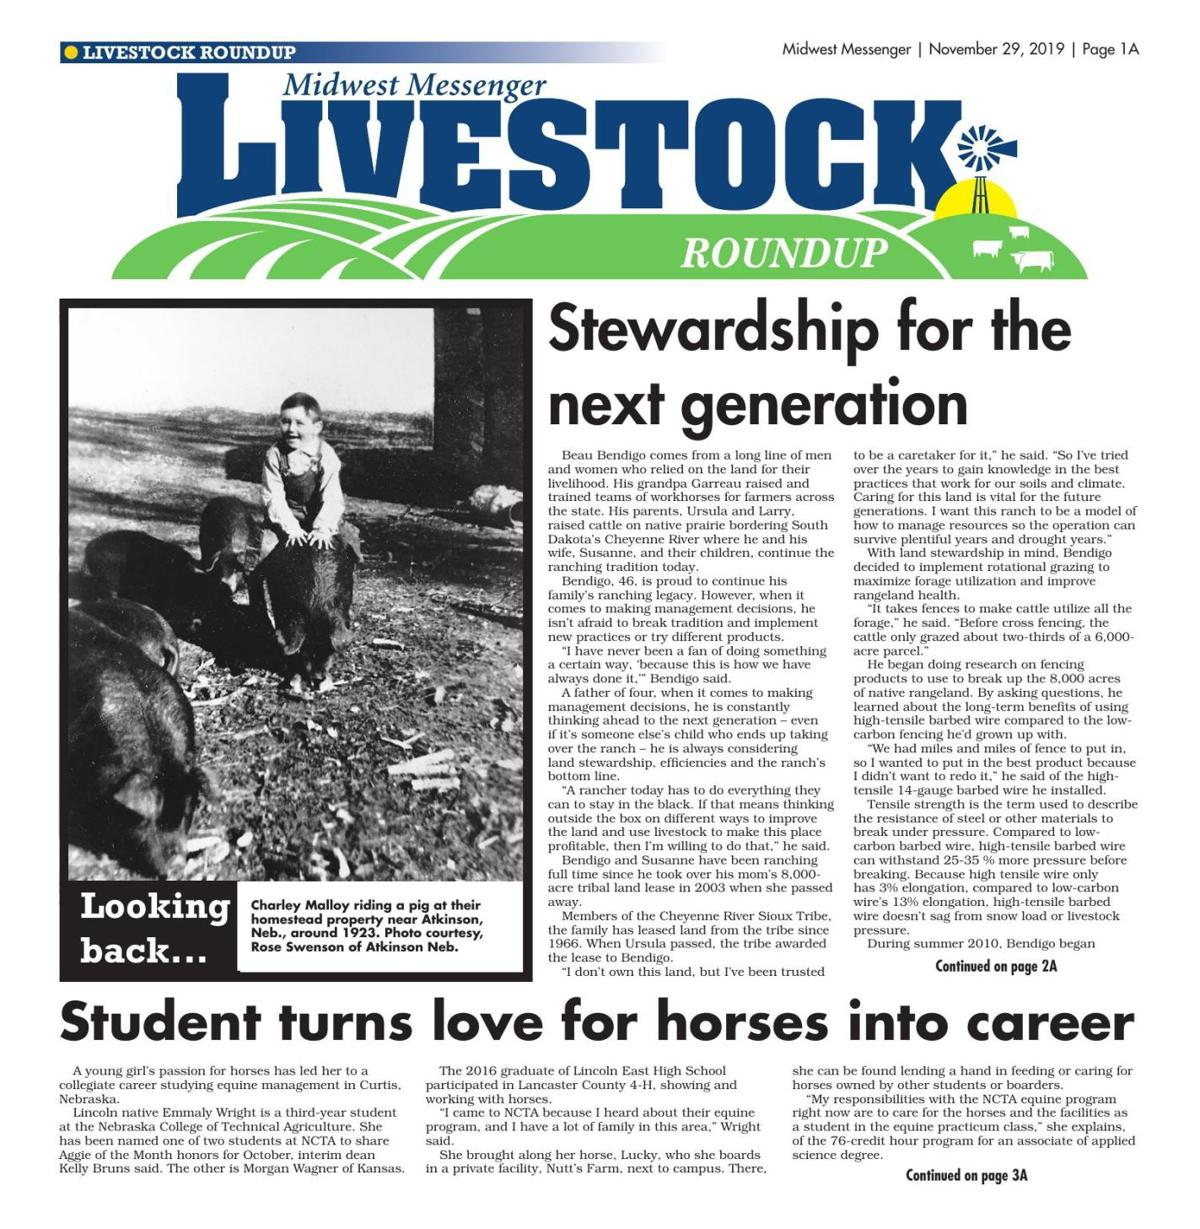 Livestock Roundup 11/29/19